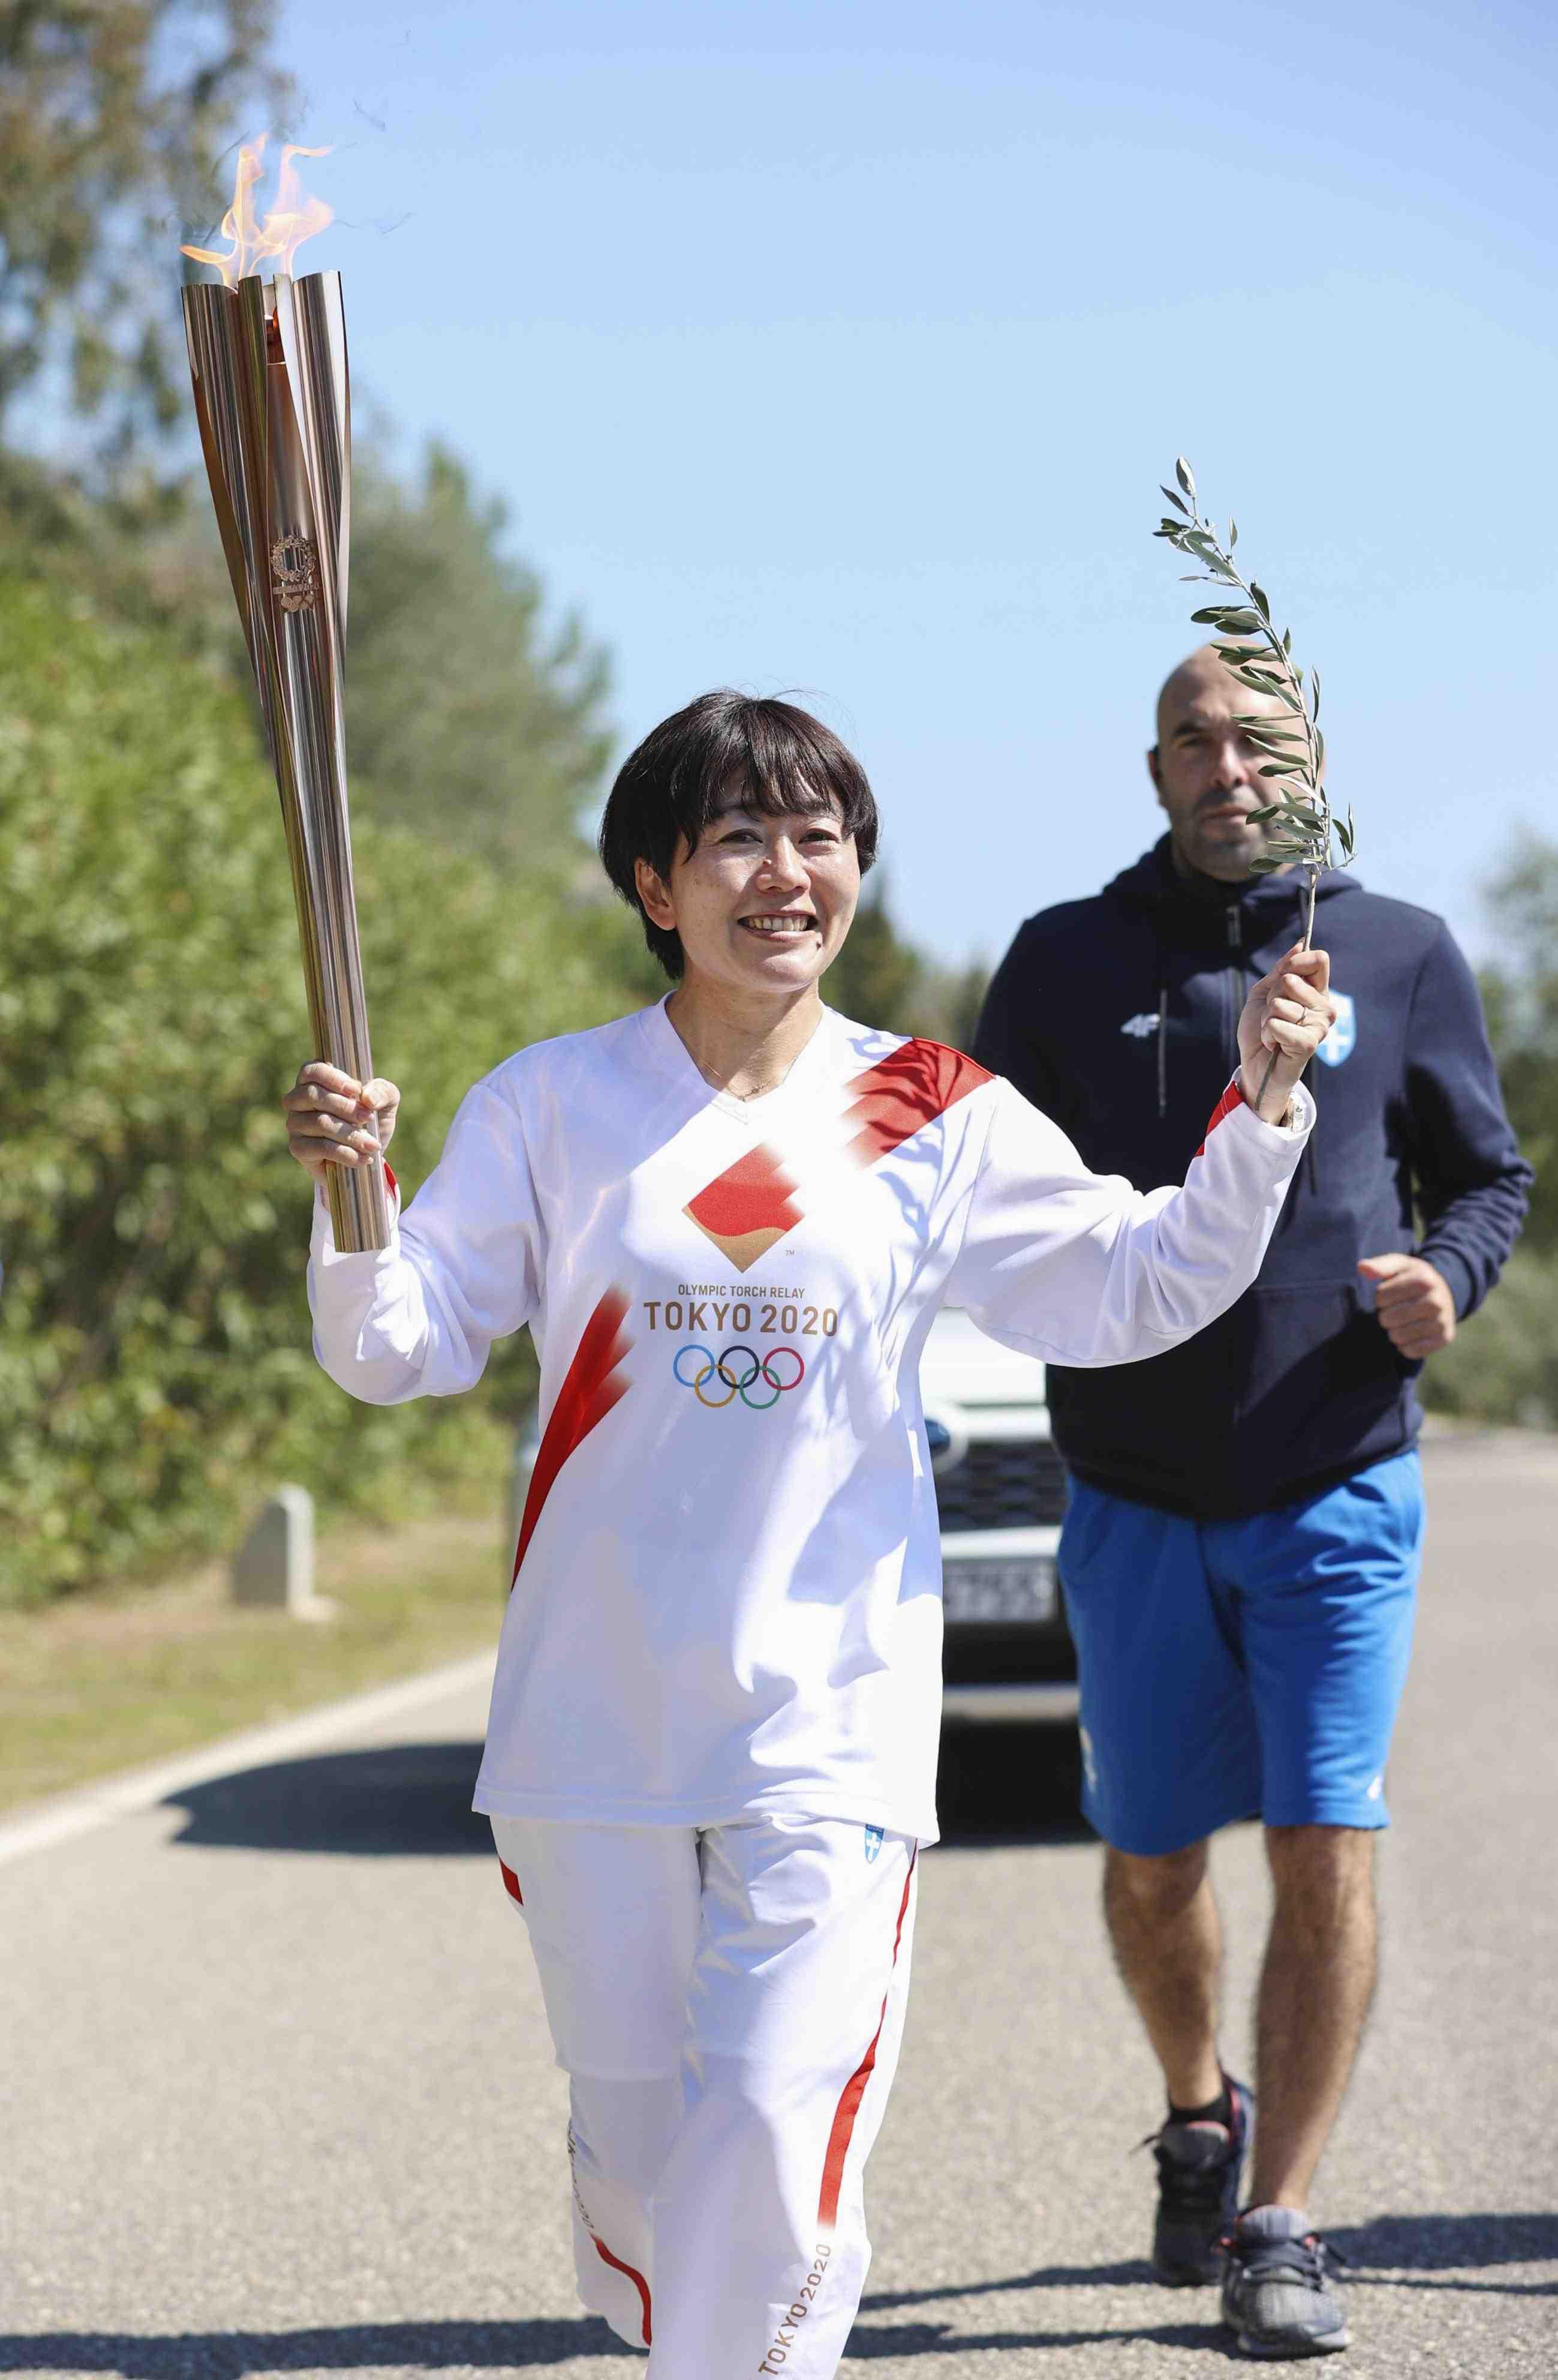 2020 Tokyo Olympics Torch Flame and Coronavirus 012